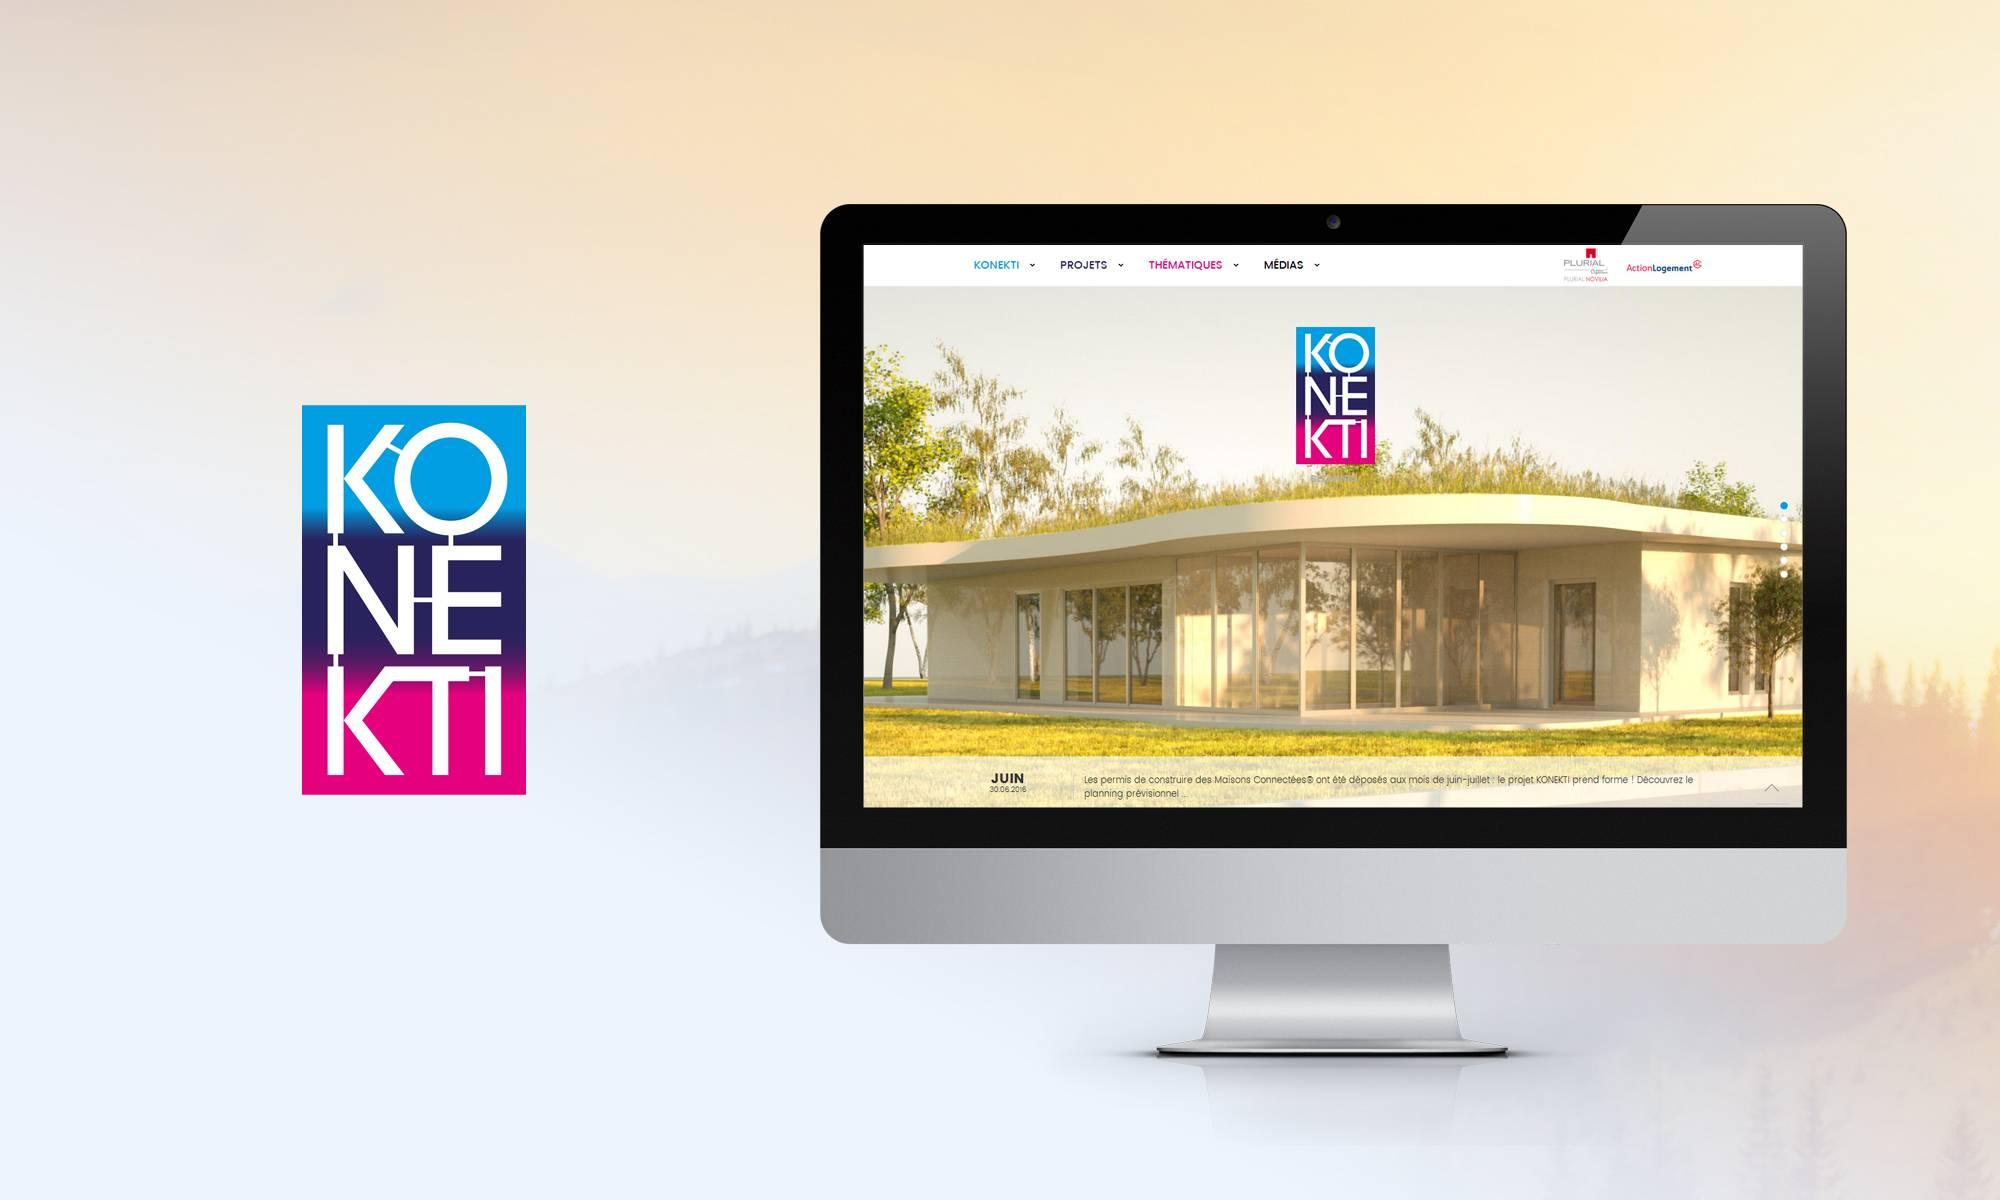 Studio NEKO - Konekti - Screen 1